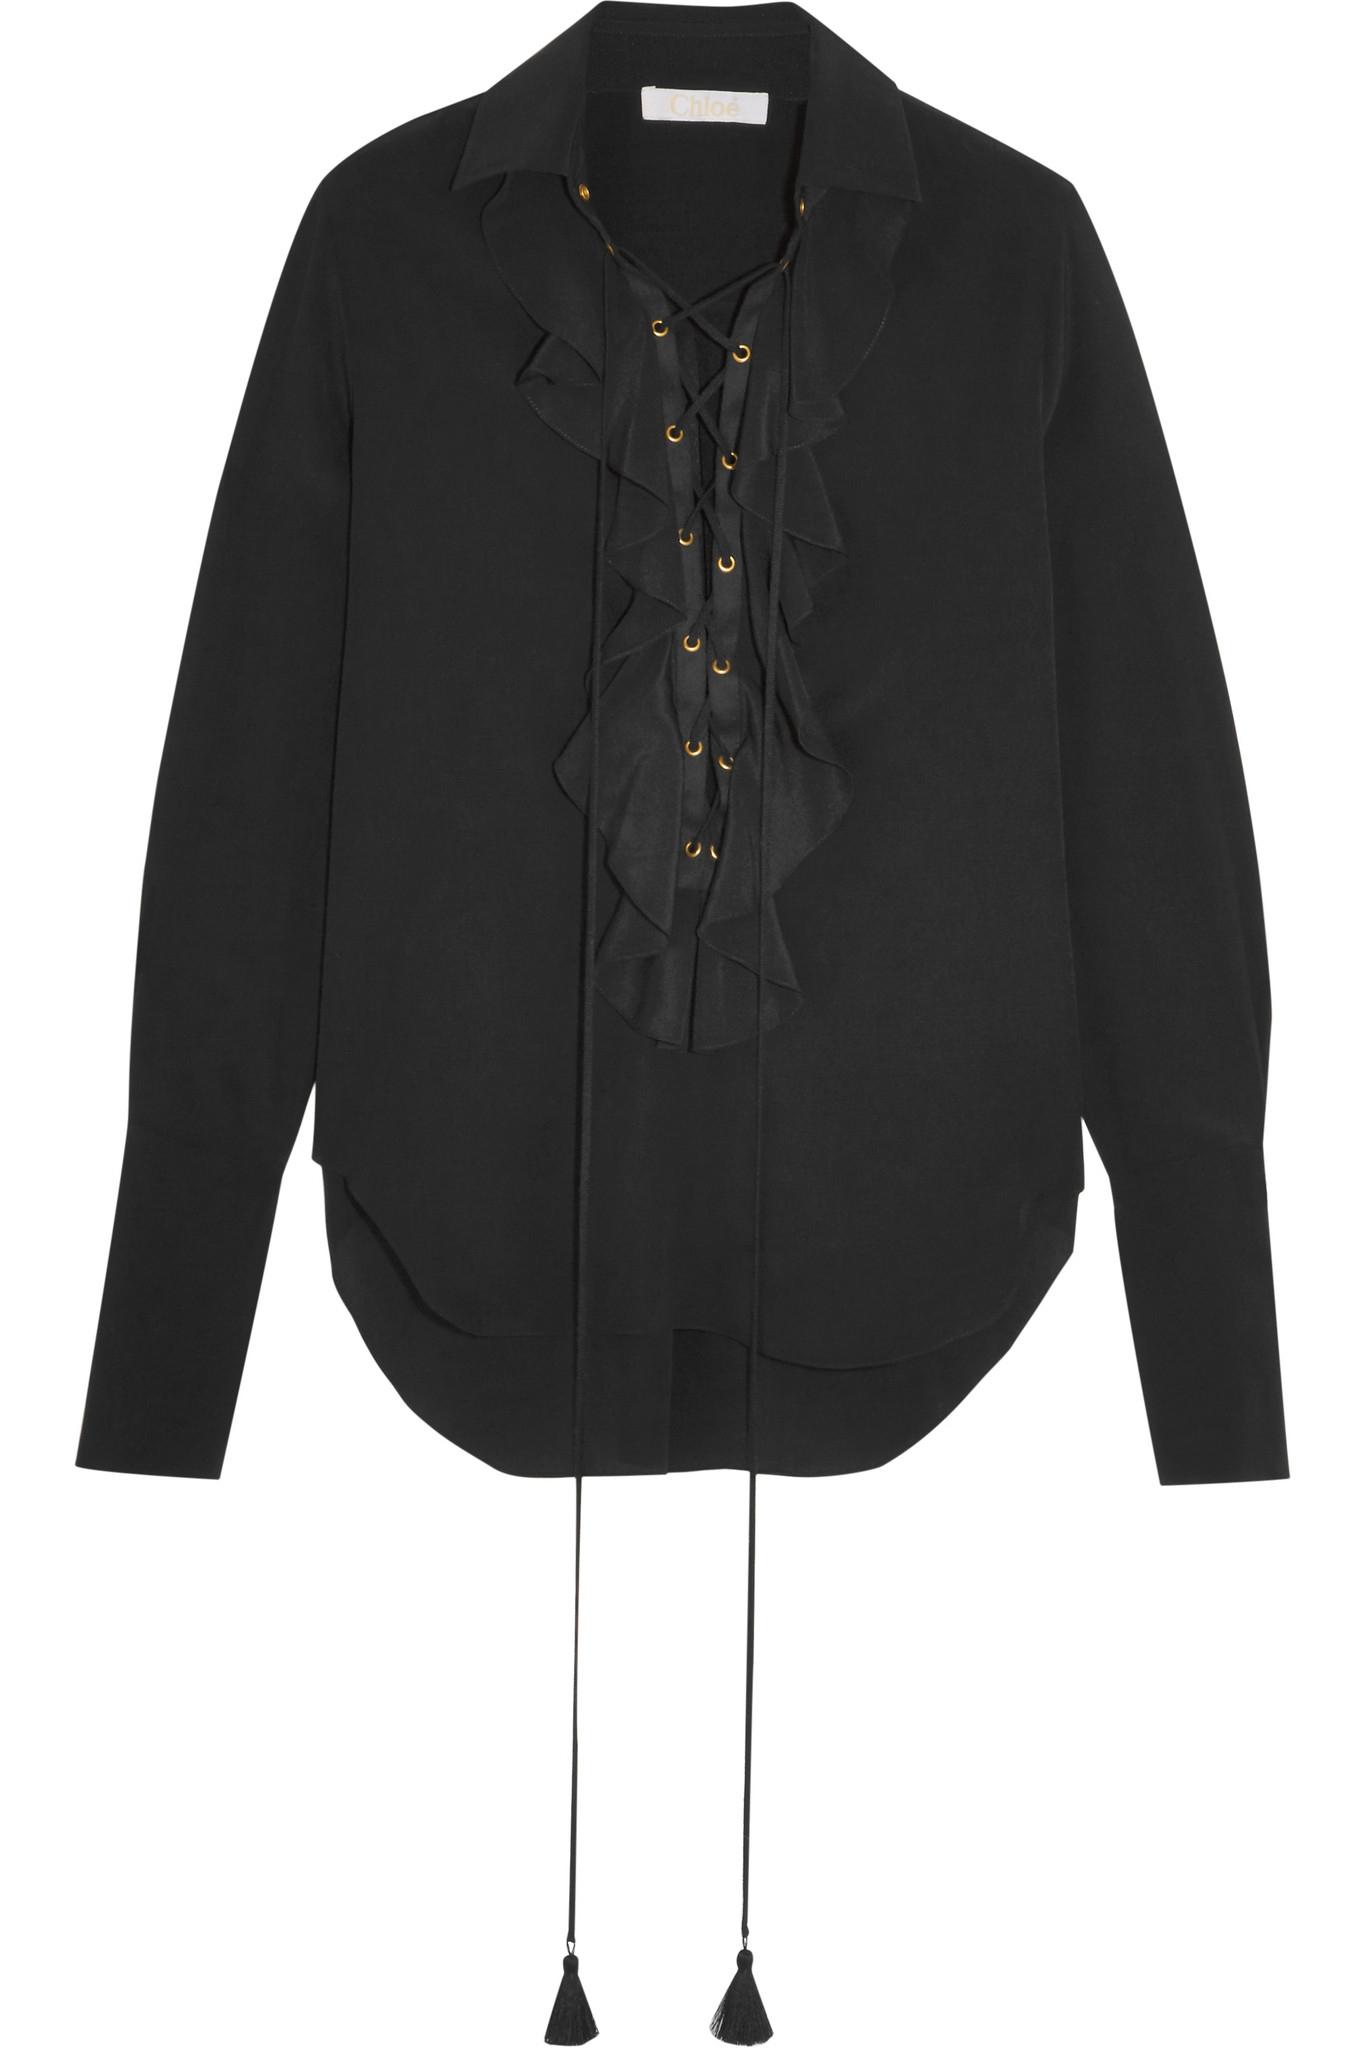 ffab73612cc3c Chloé Chloé Ruffled Silk Crepe De Chine Blouse in Black - Lyst